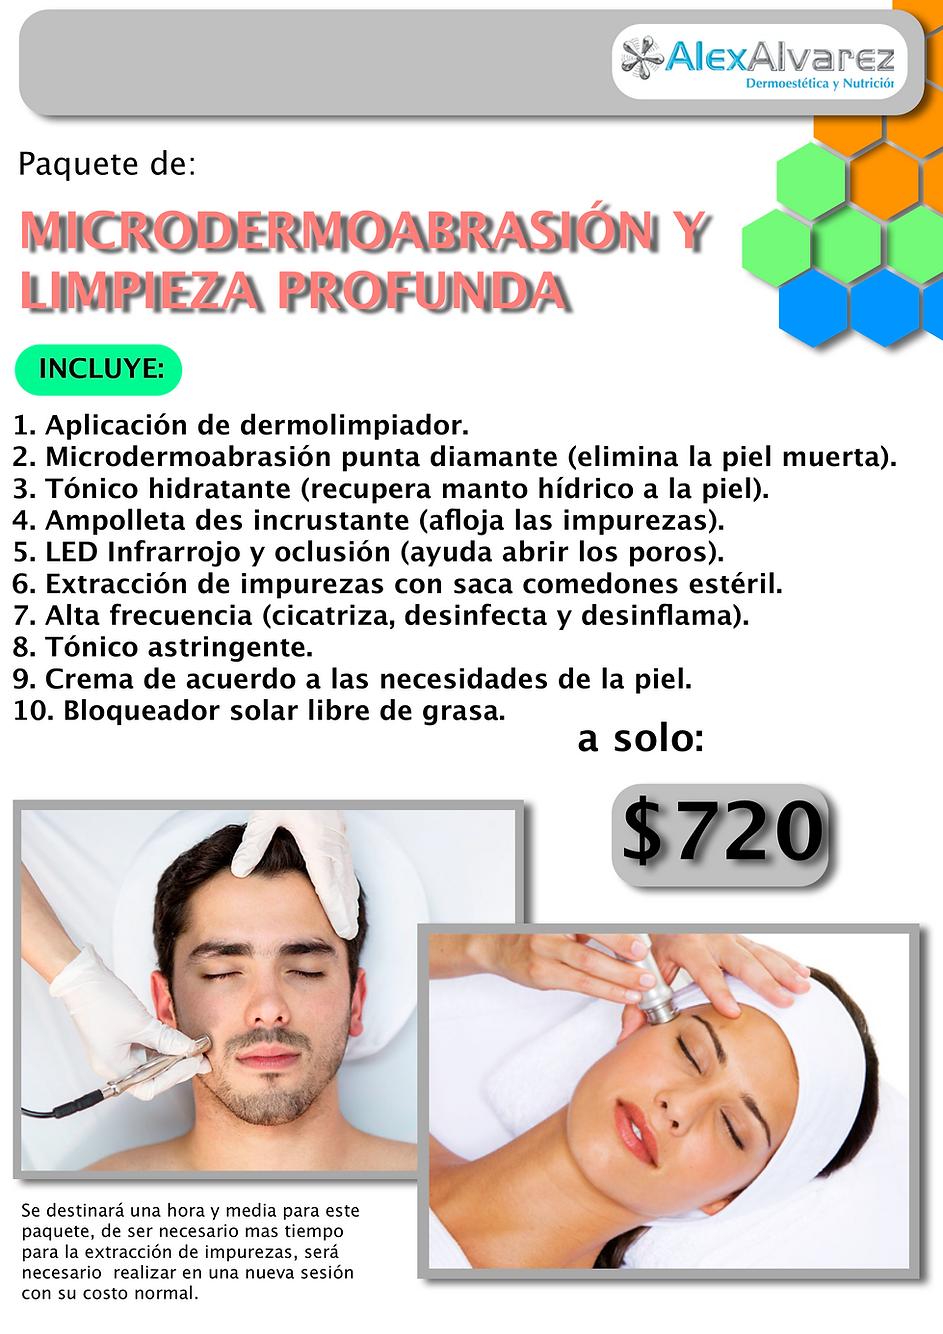 Microdermoabrasion NOV 19.png